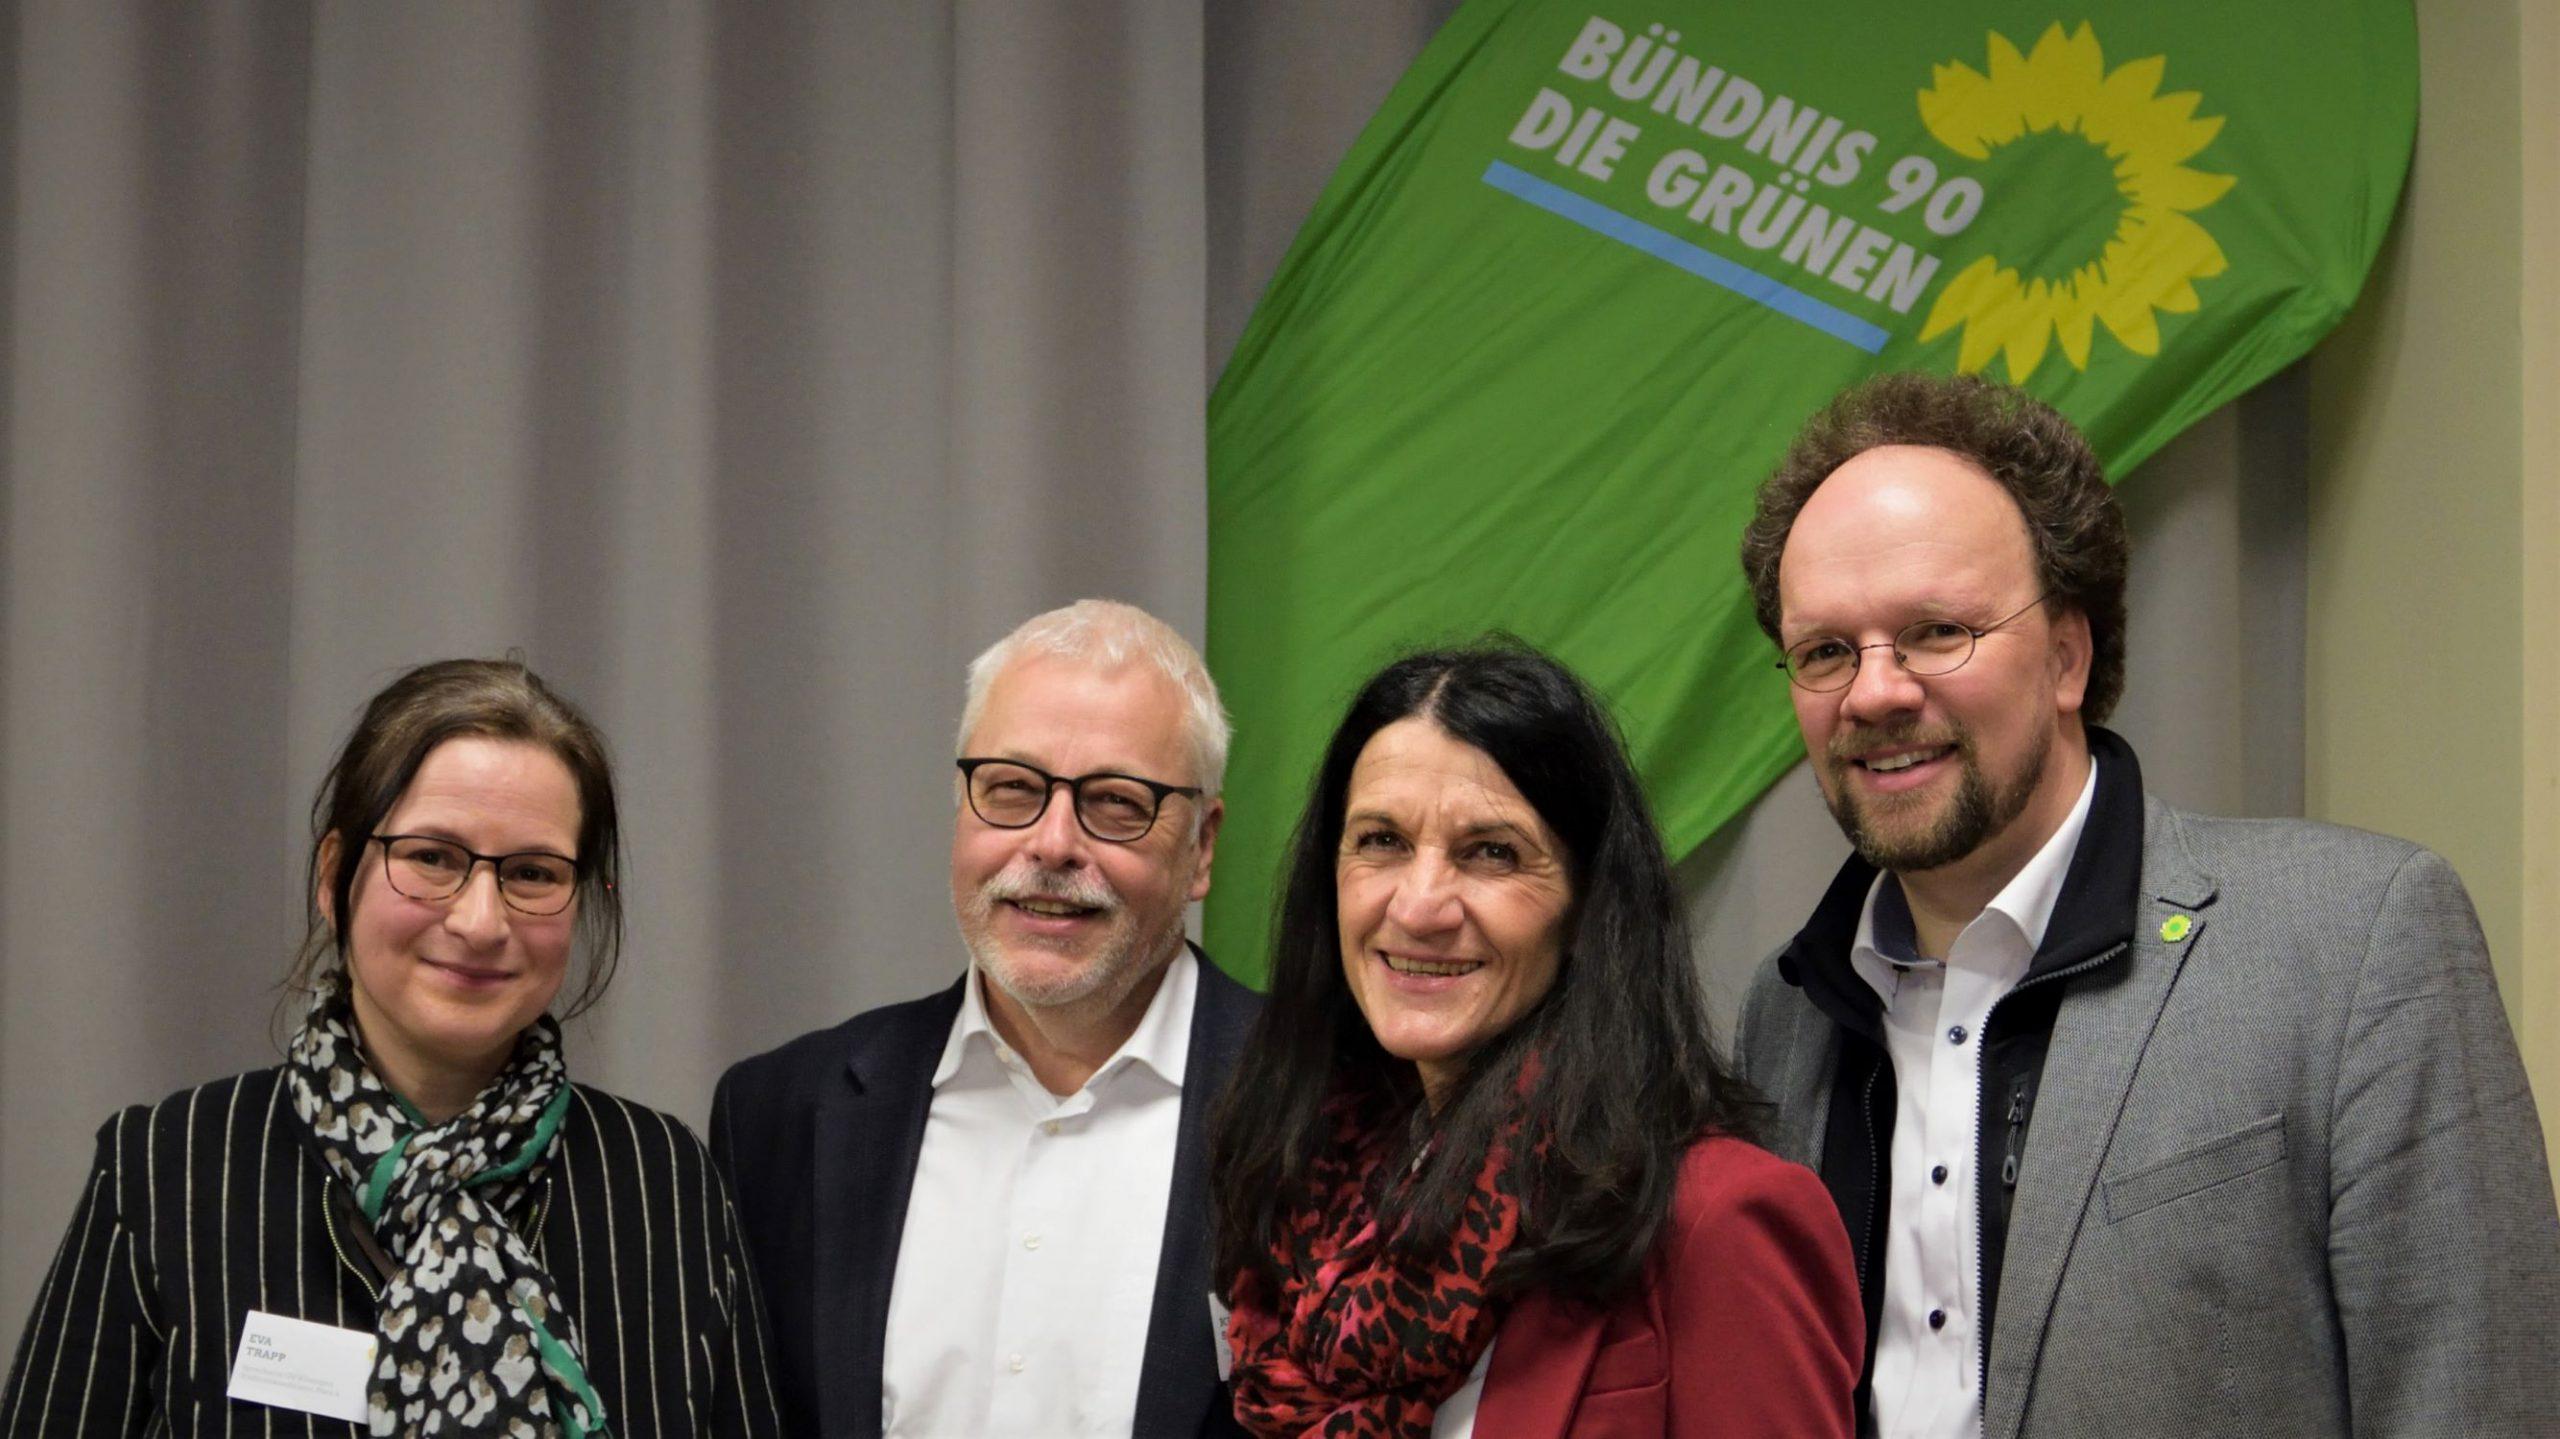 Klimawandel – Anpassungsstrategien vor Ort in Kitzingen